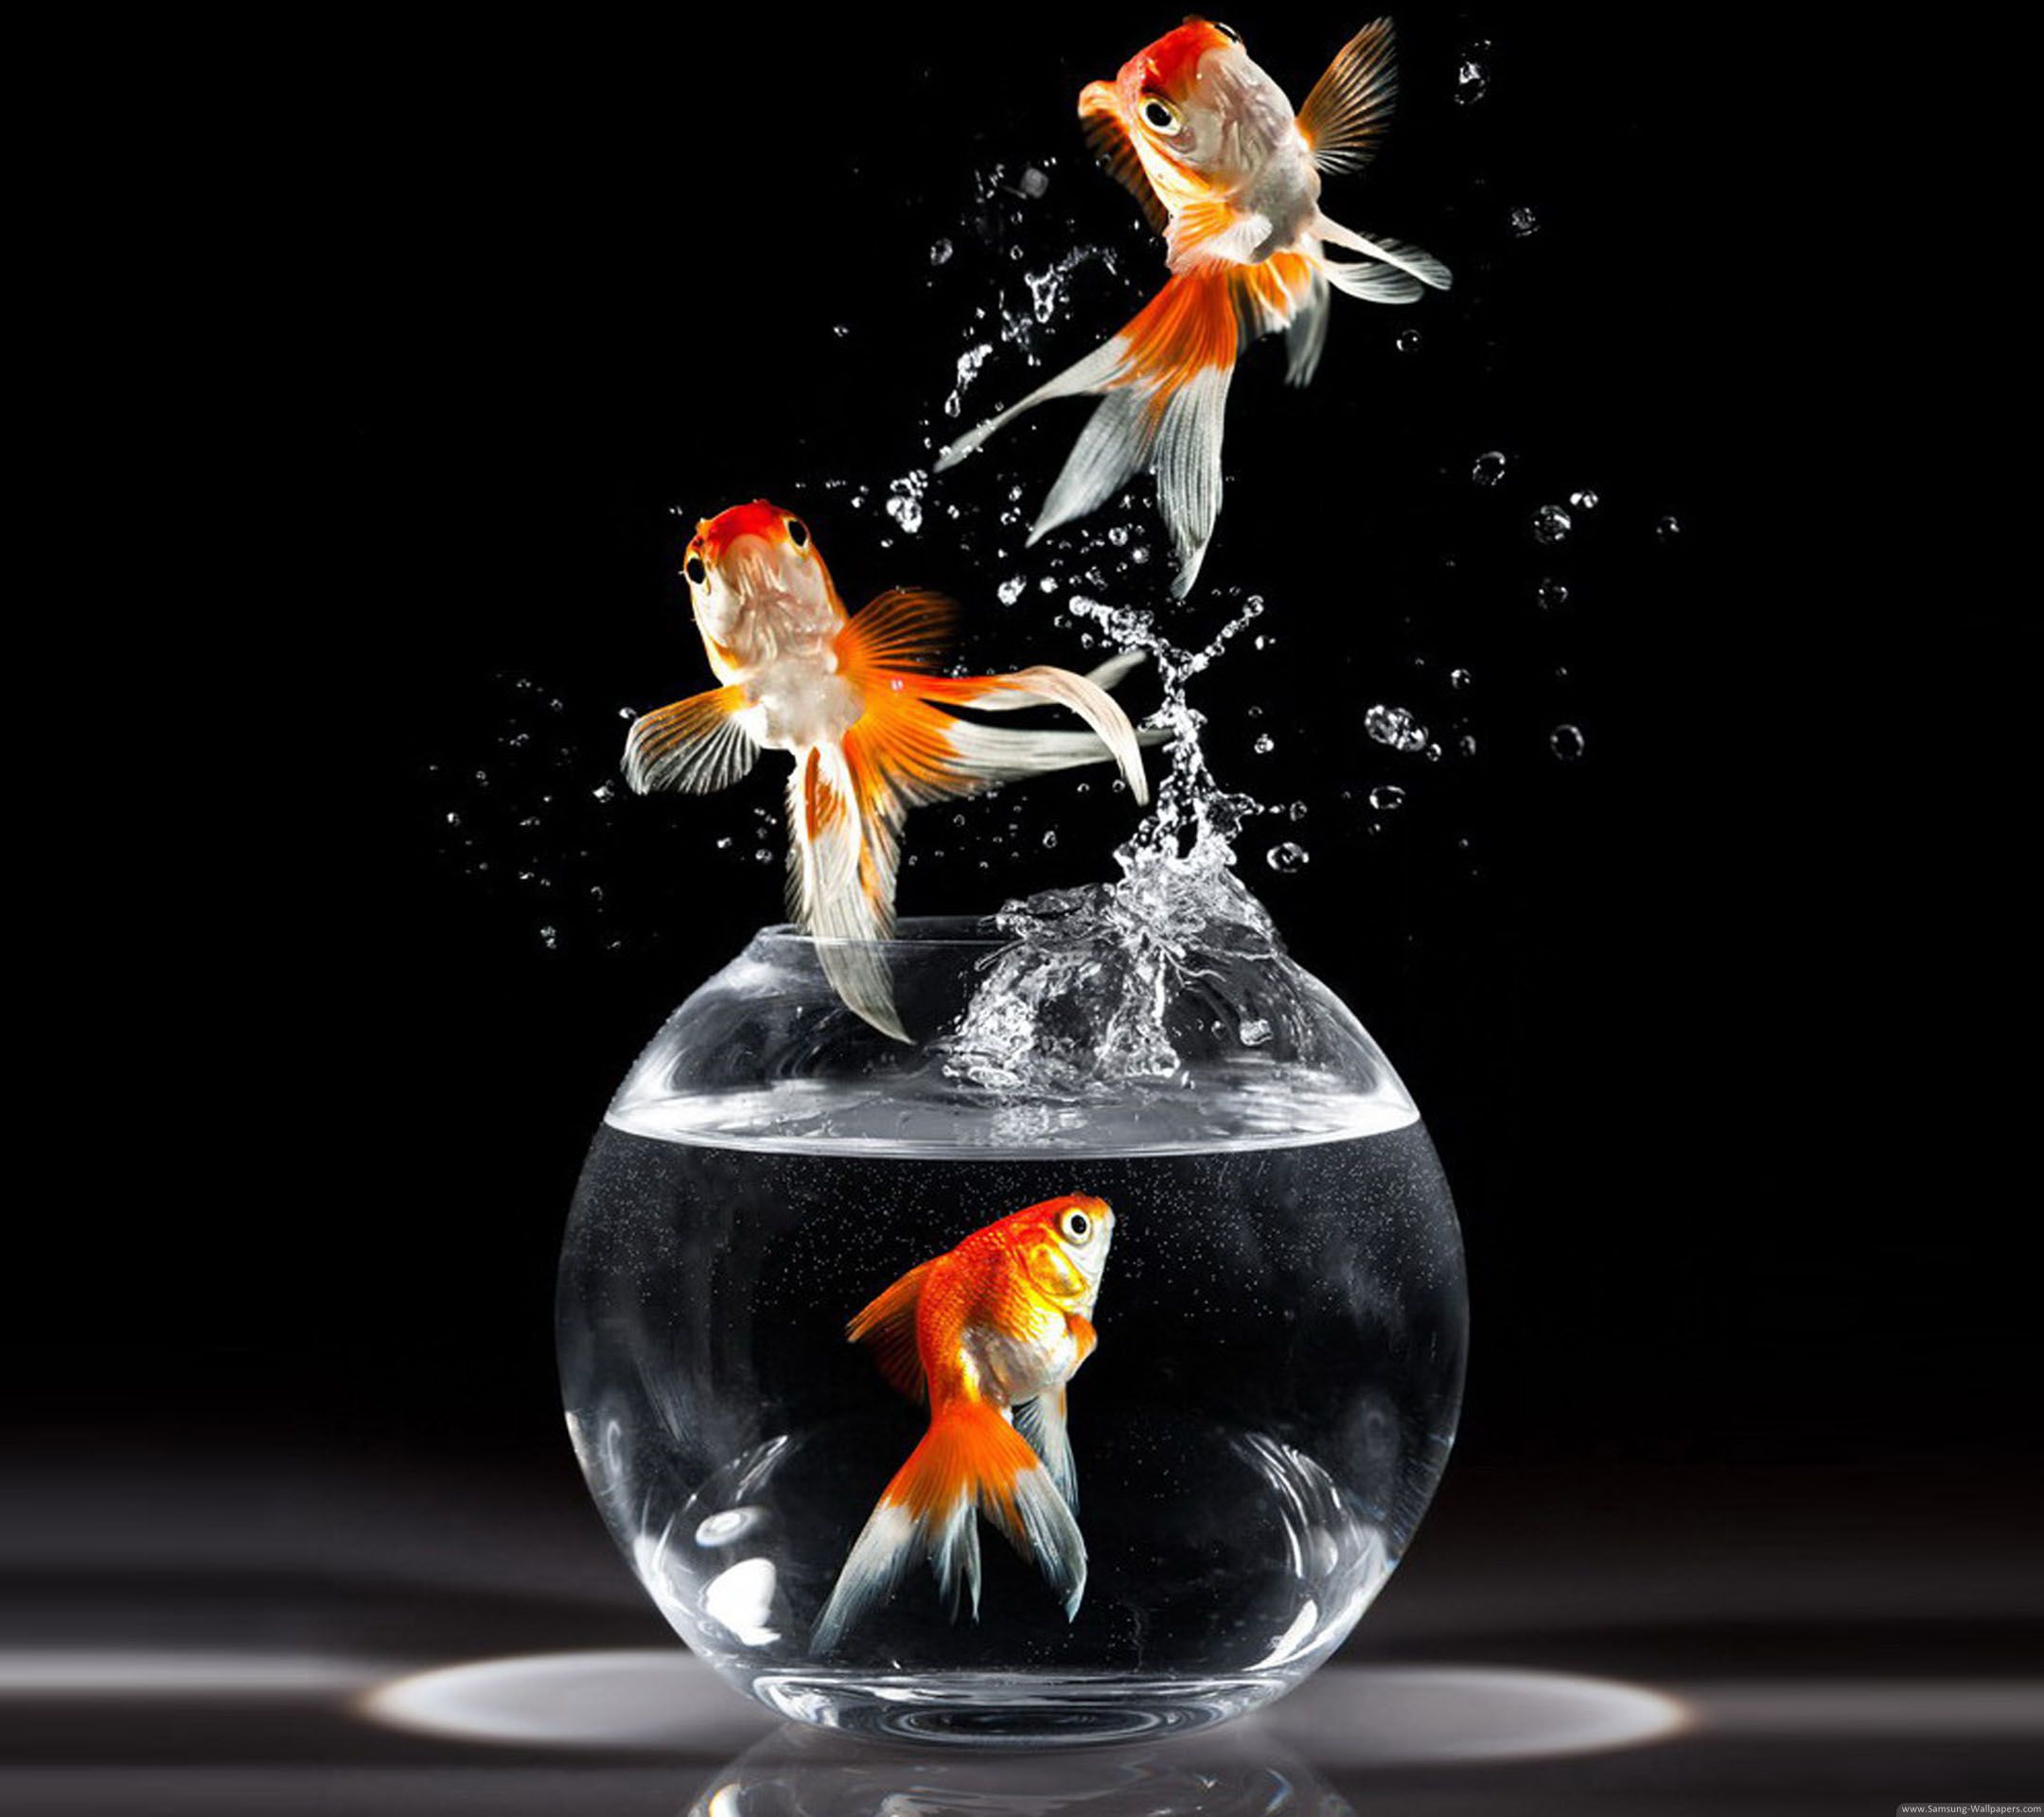 cute goldfish wallpaper Google Search Fish wallpaper